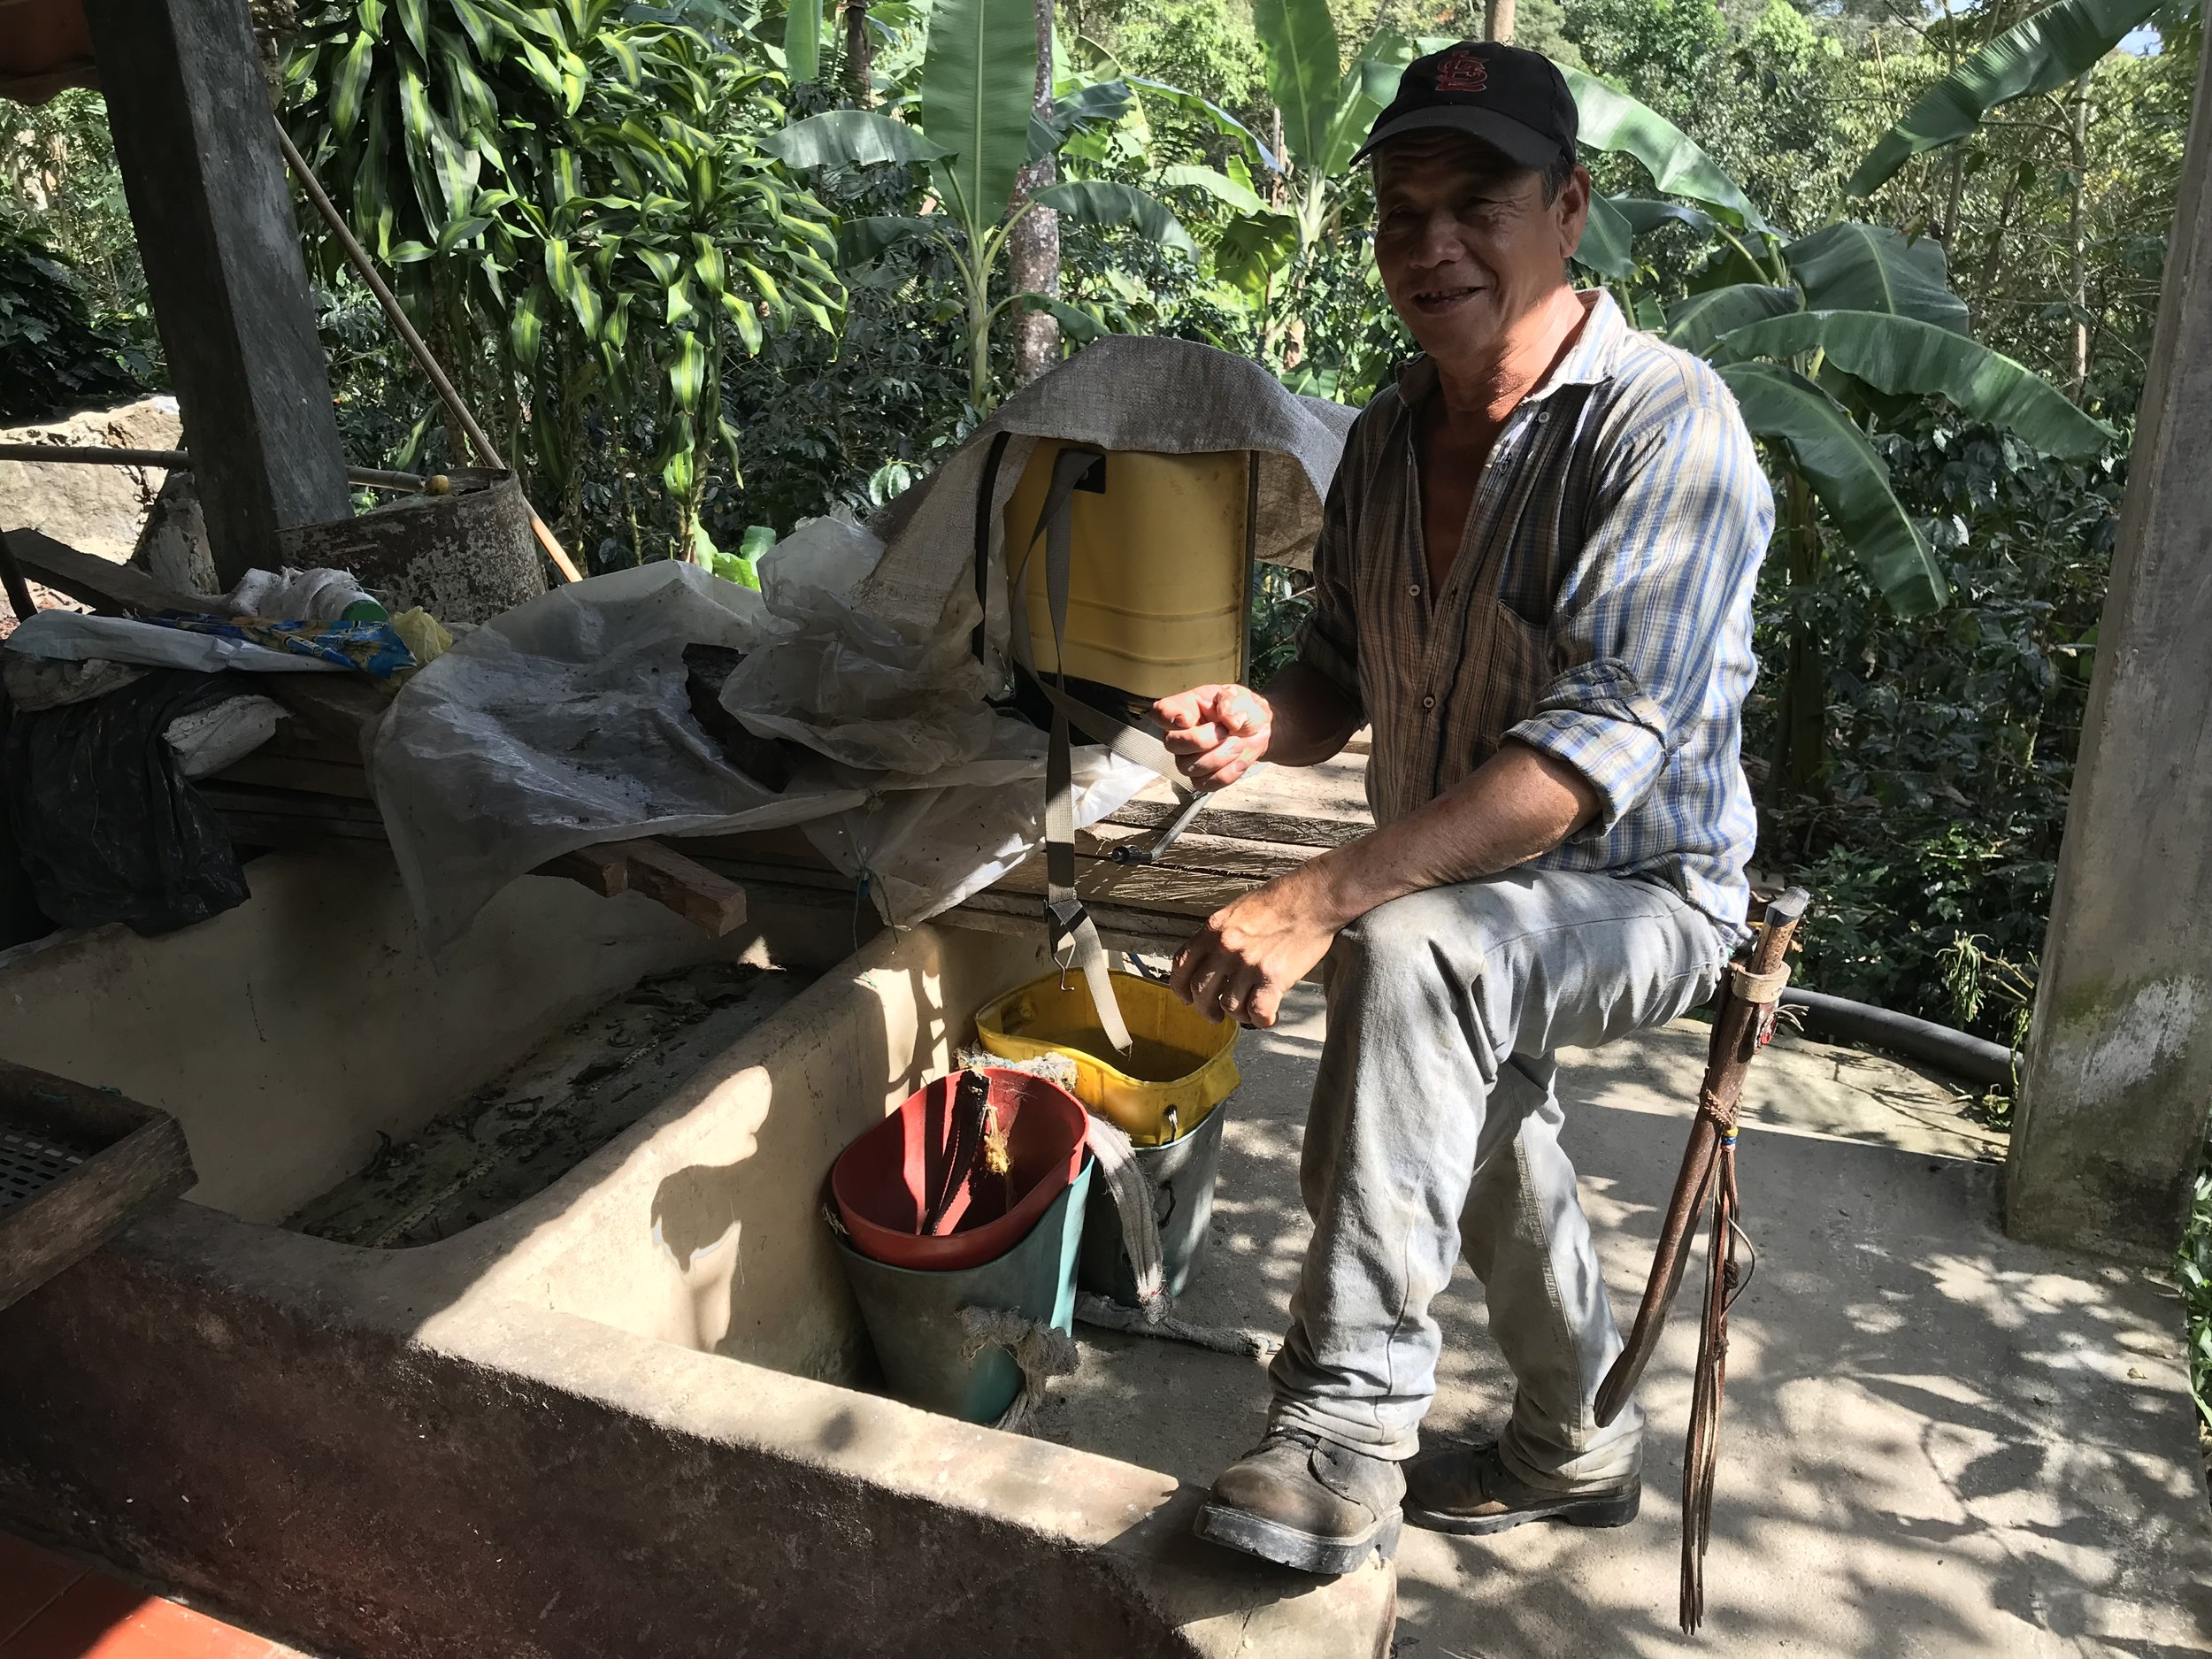 Faustino Reyes, Producer for the La Palma y El Tucan Neighbors & Crops Series